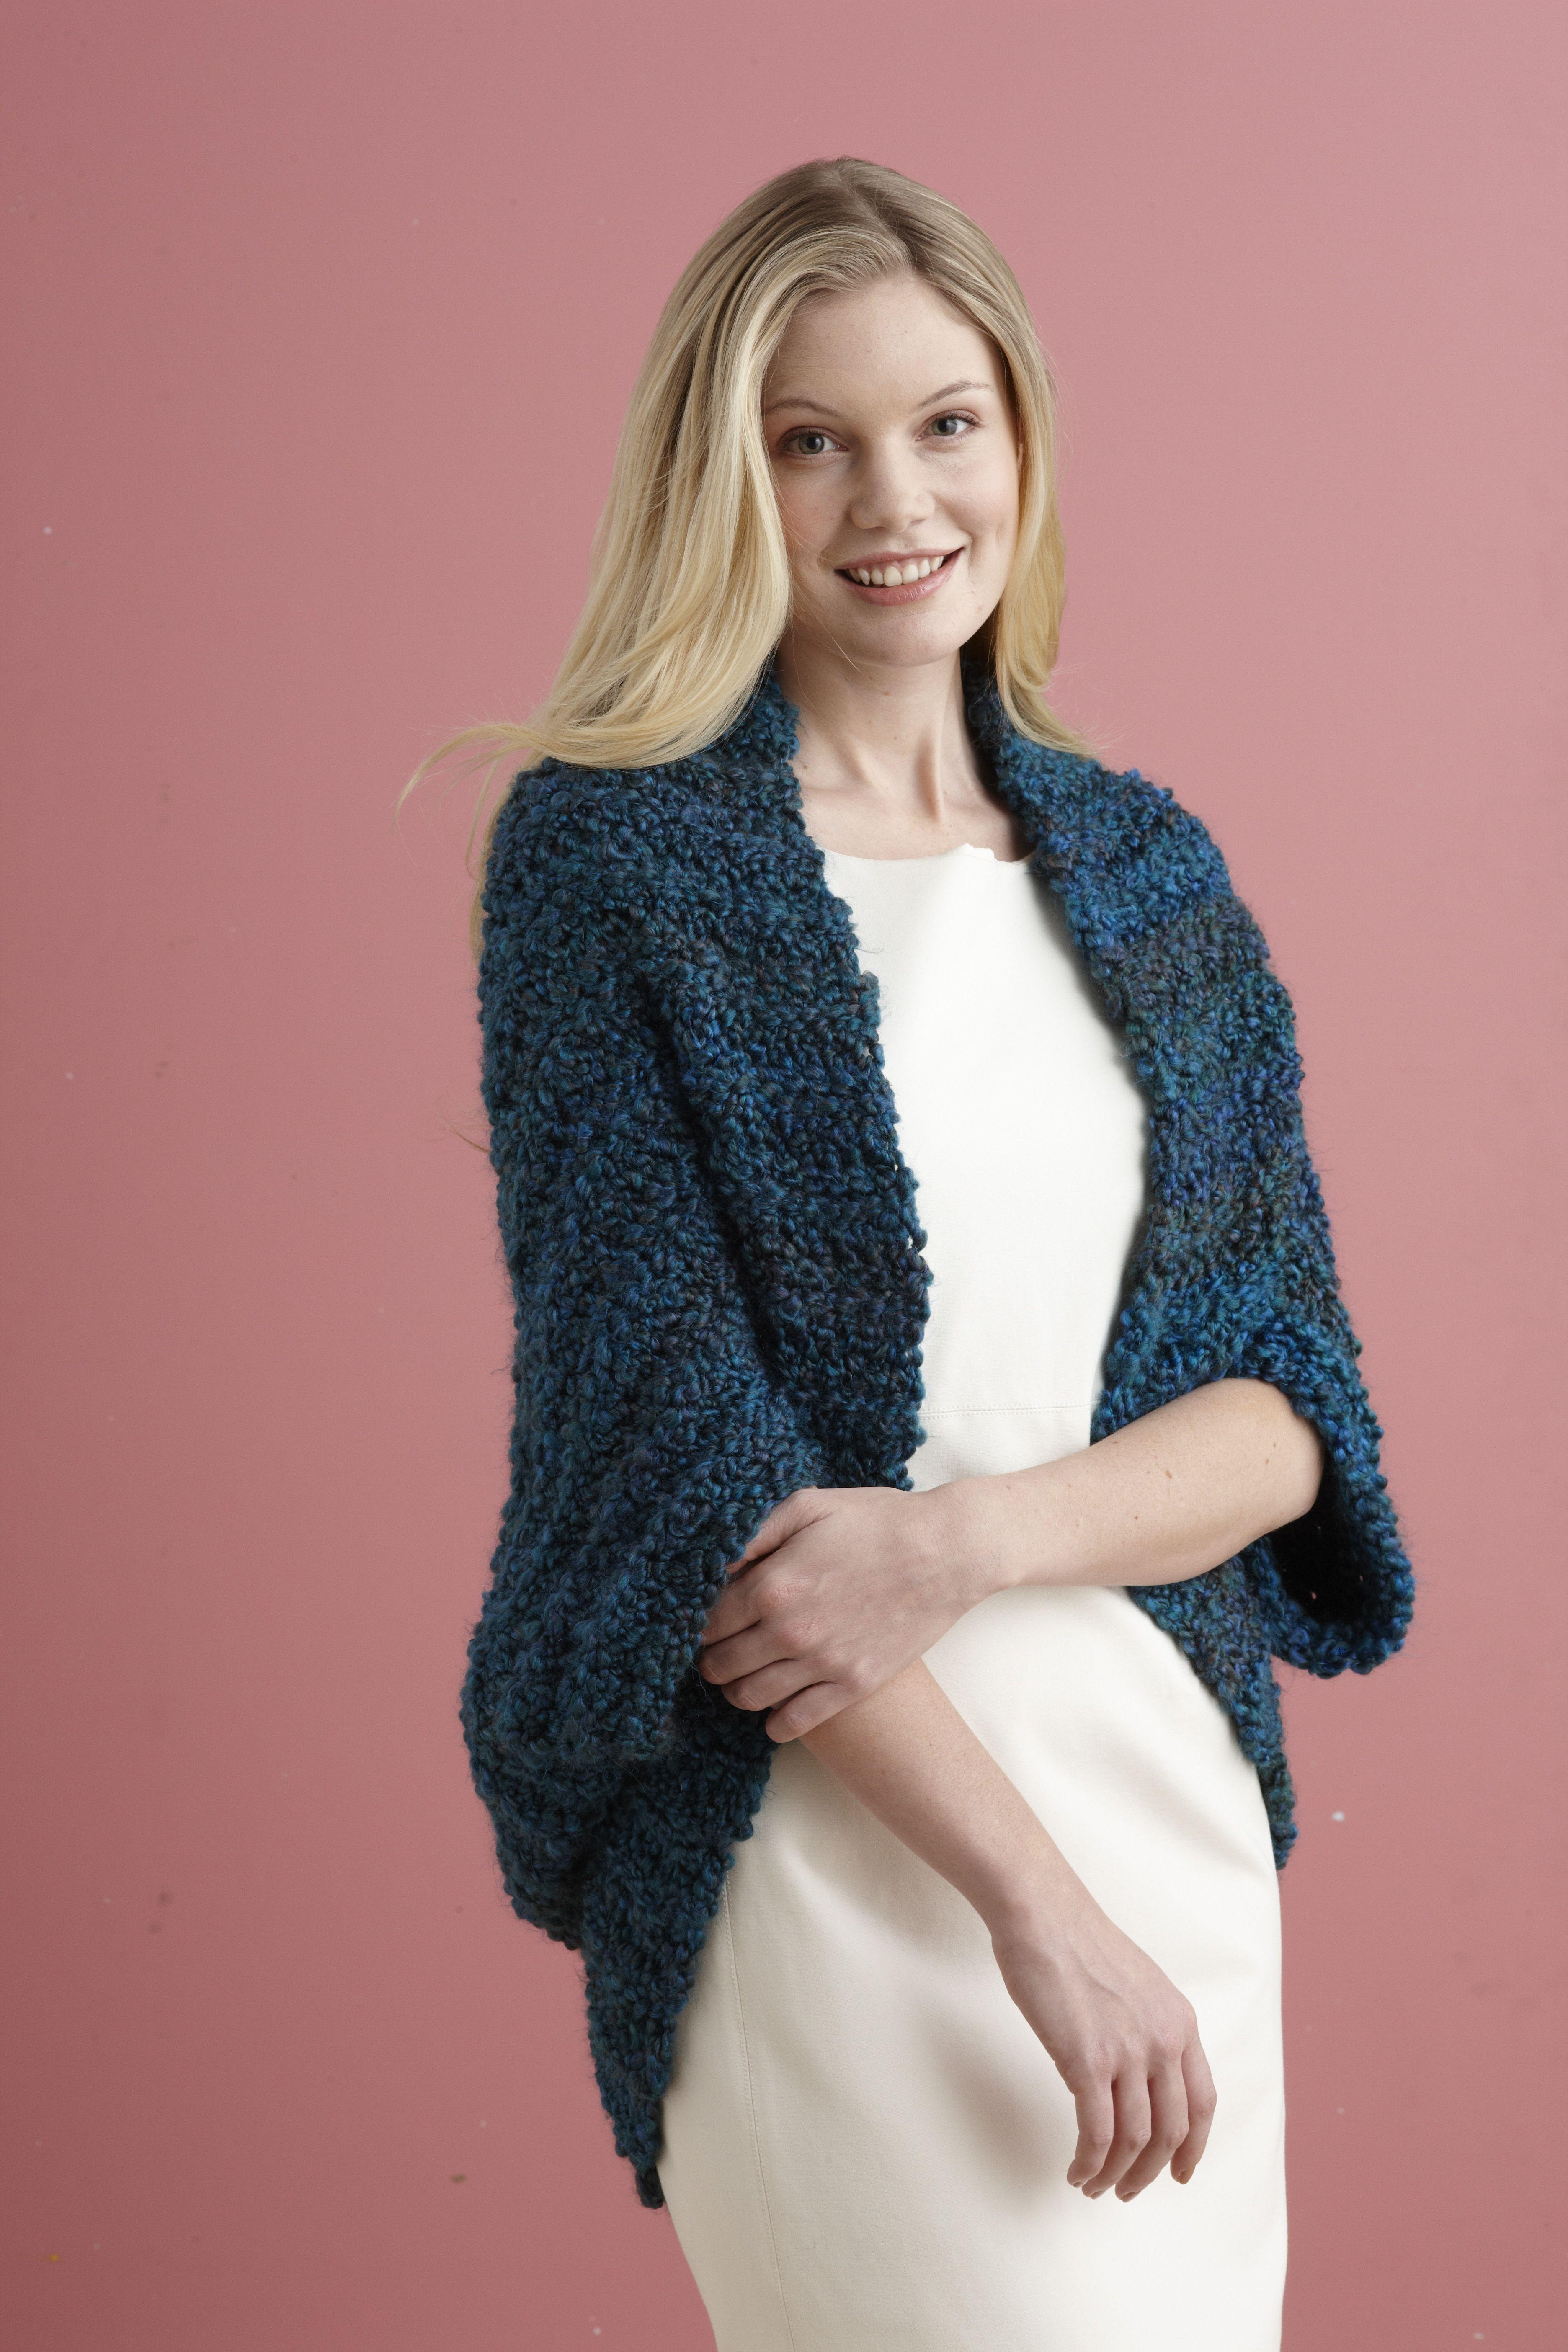 Funky Red Lion Crochet Patterns Crest - Blanket Knitting Pattern ...